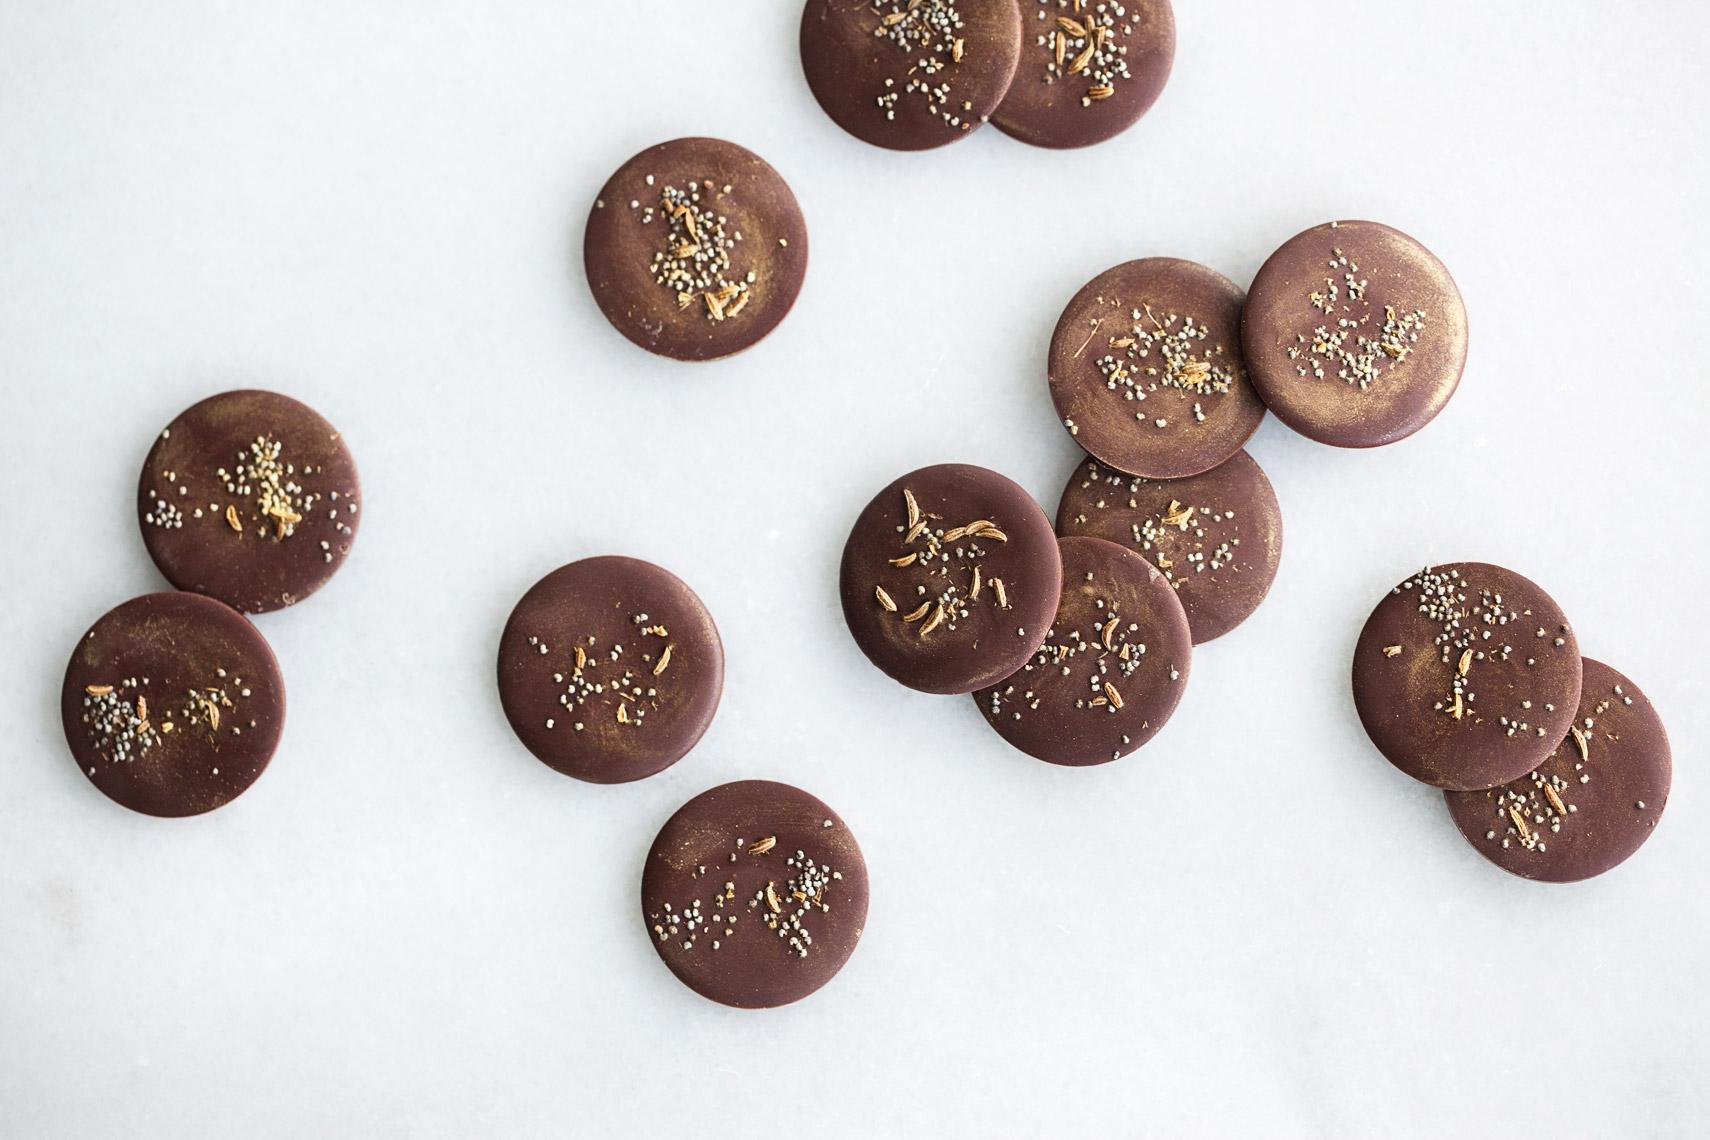 chocolates8-webres.jpg